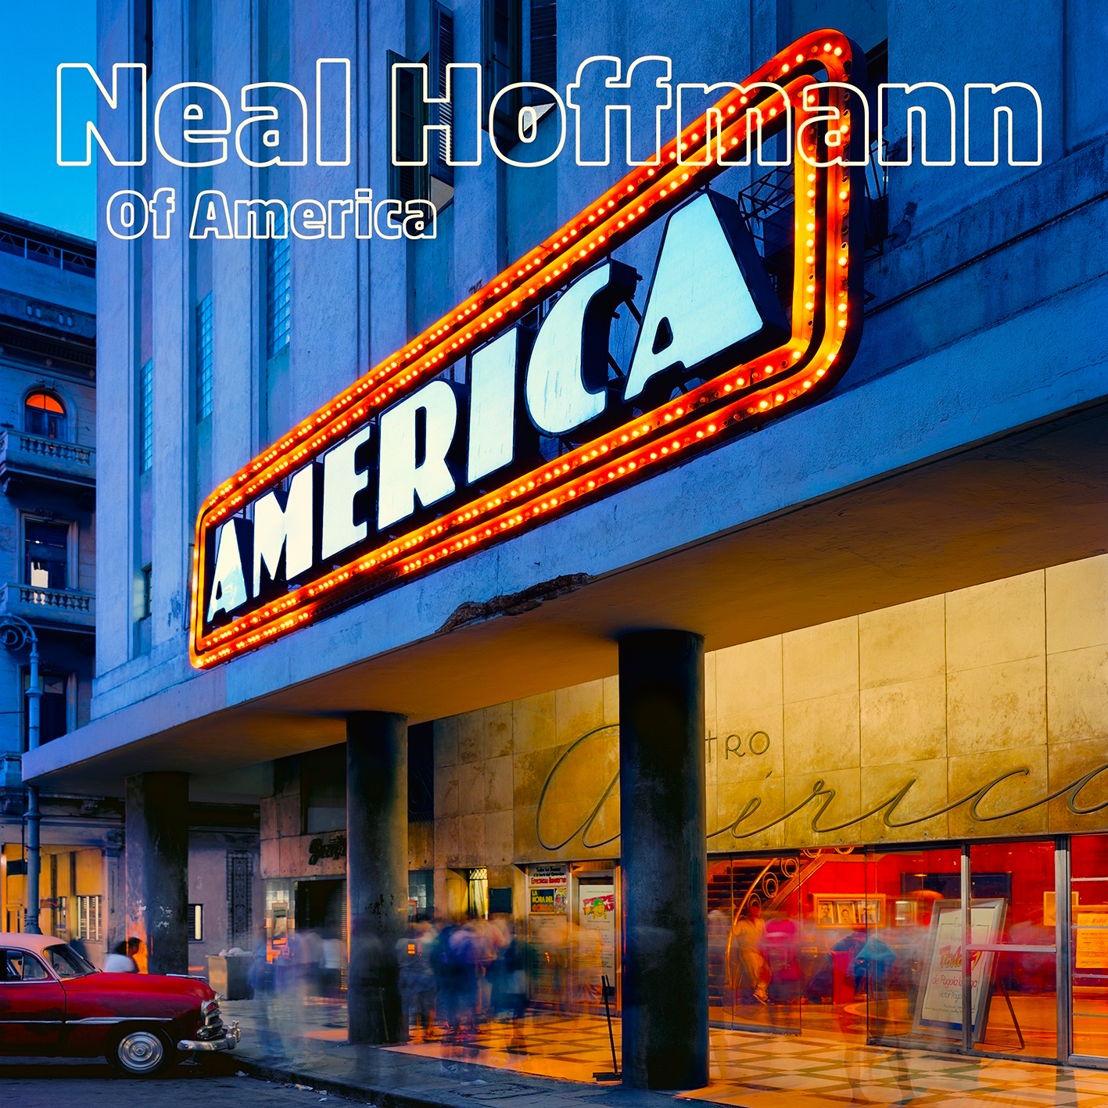 Neal Hoffmann - Of America (EP impacts 8/15 June)